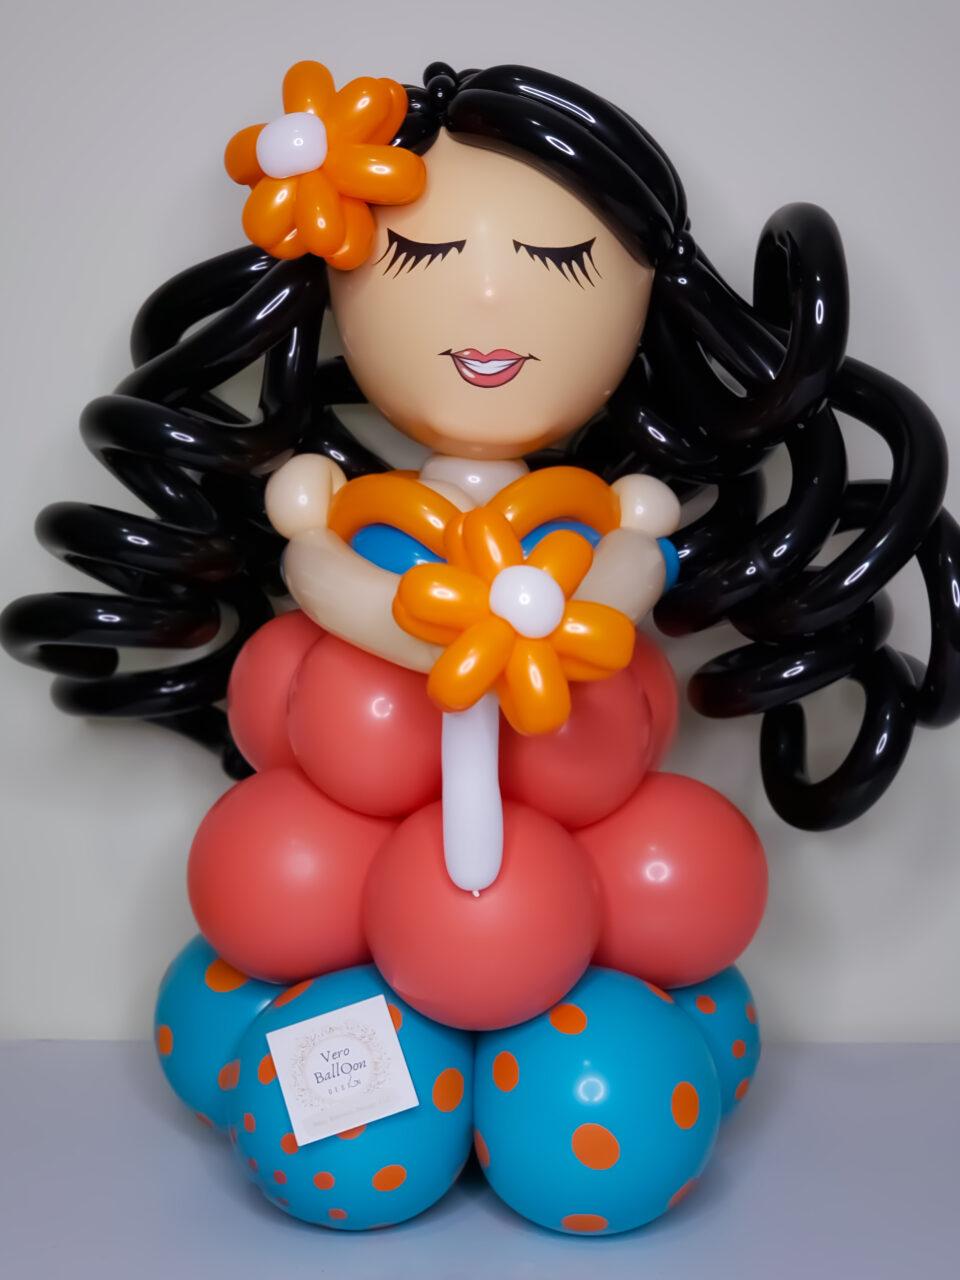 Adela- veroballoon.com Decorations Miami